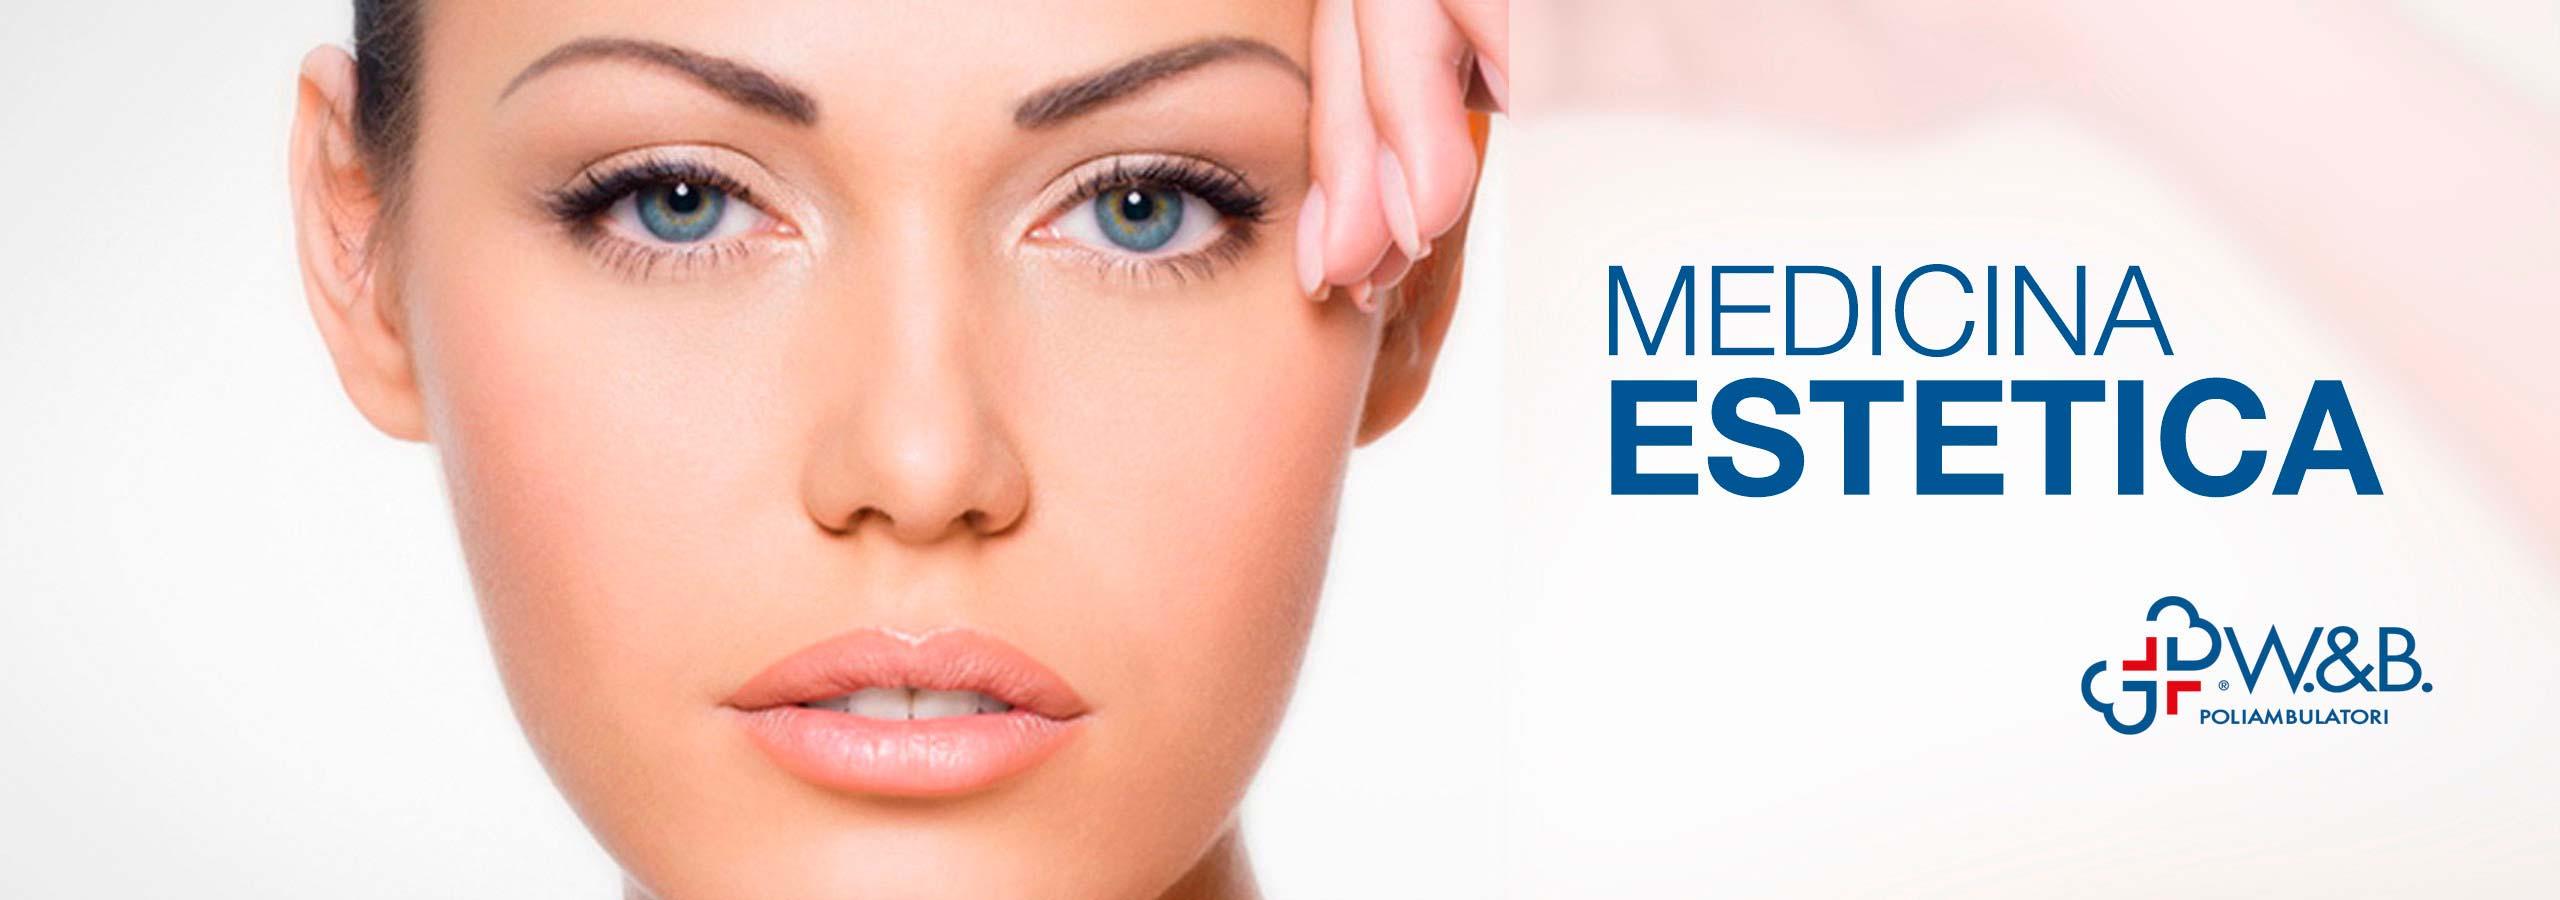 slide_medicina estetica